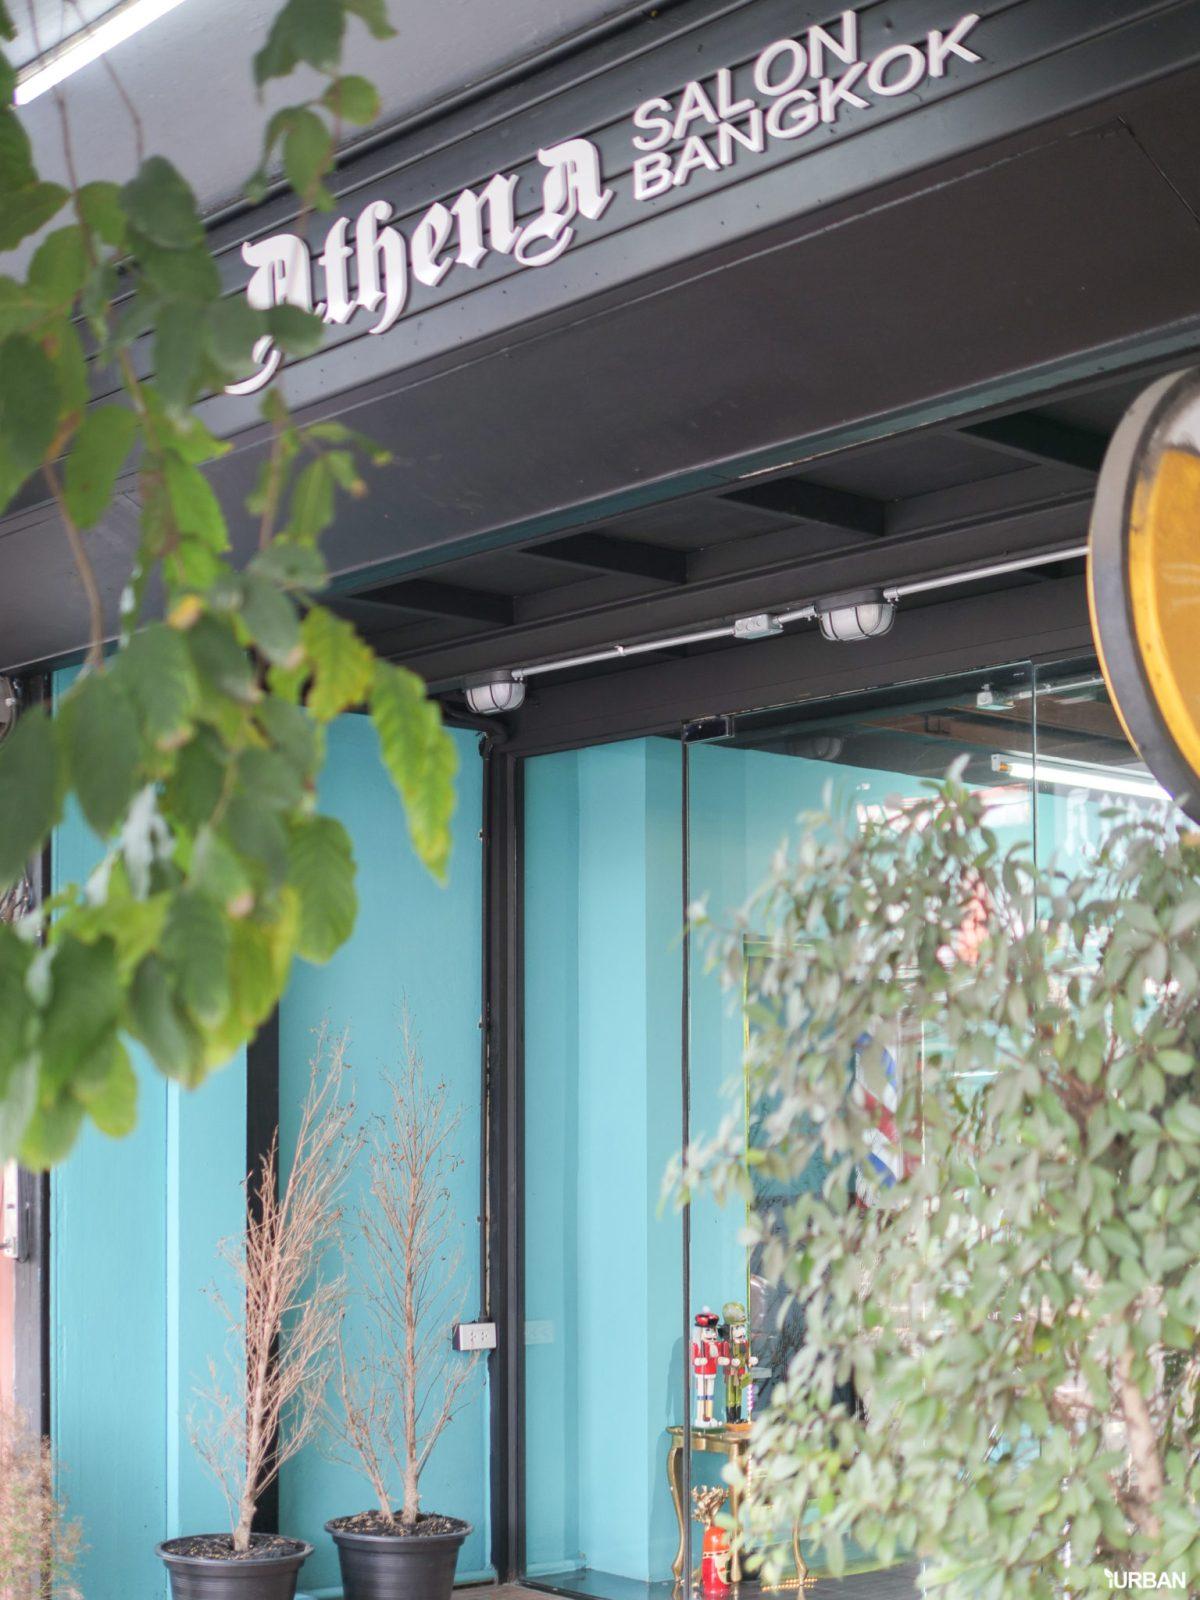 "7 Simply Creative Cafe & Bar ในย่านไลฟ์สไลต์สุดฮิป กับ 24 Hr. Co-Working Space กลาง New Interchange ""รัชดา - ลาดพร้าว"" 68 - cafe"